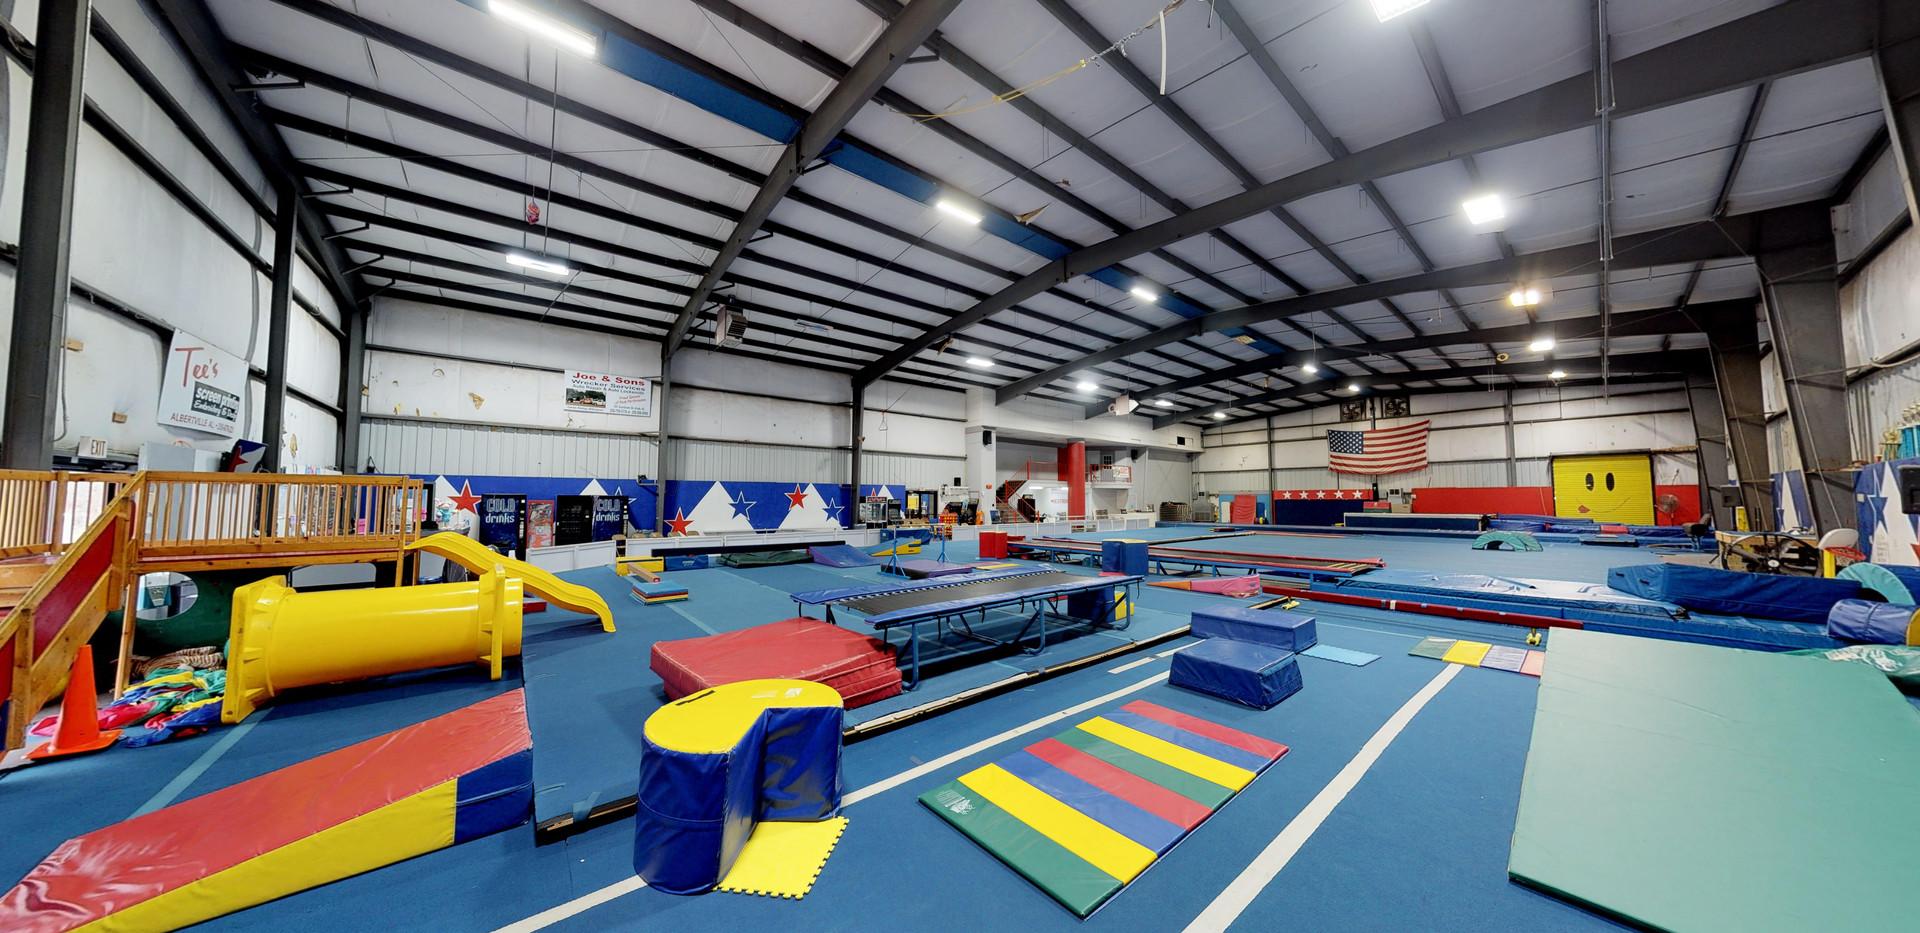 sports center2.jpg